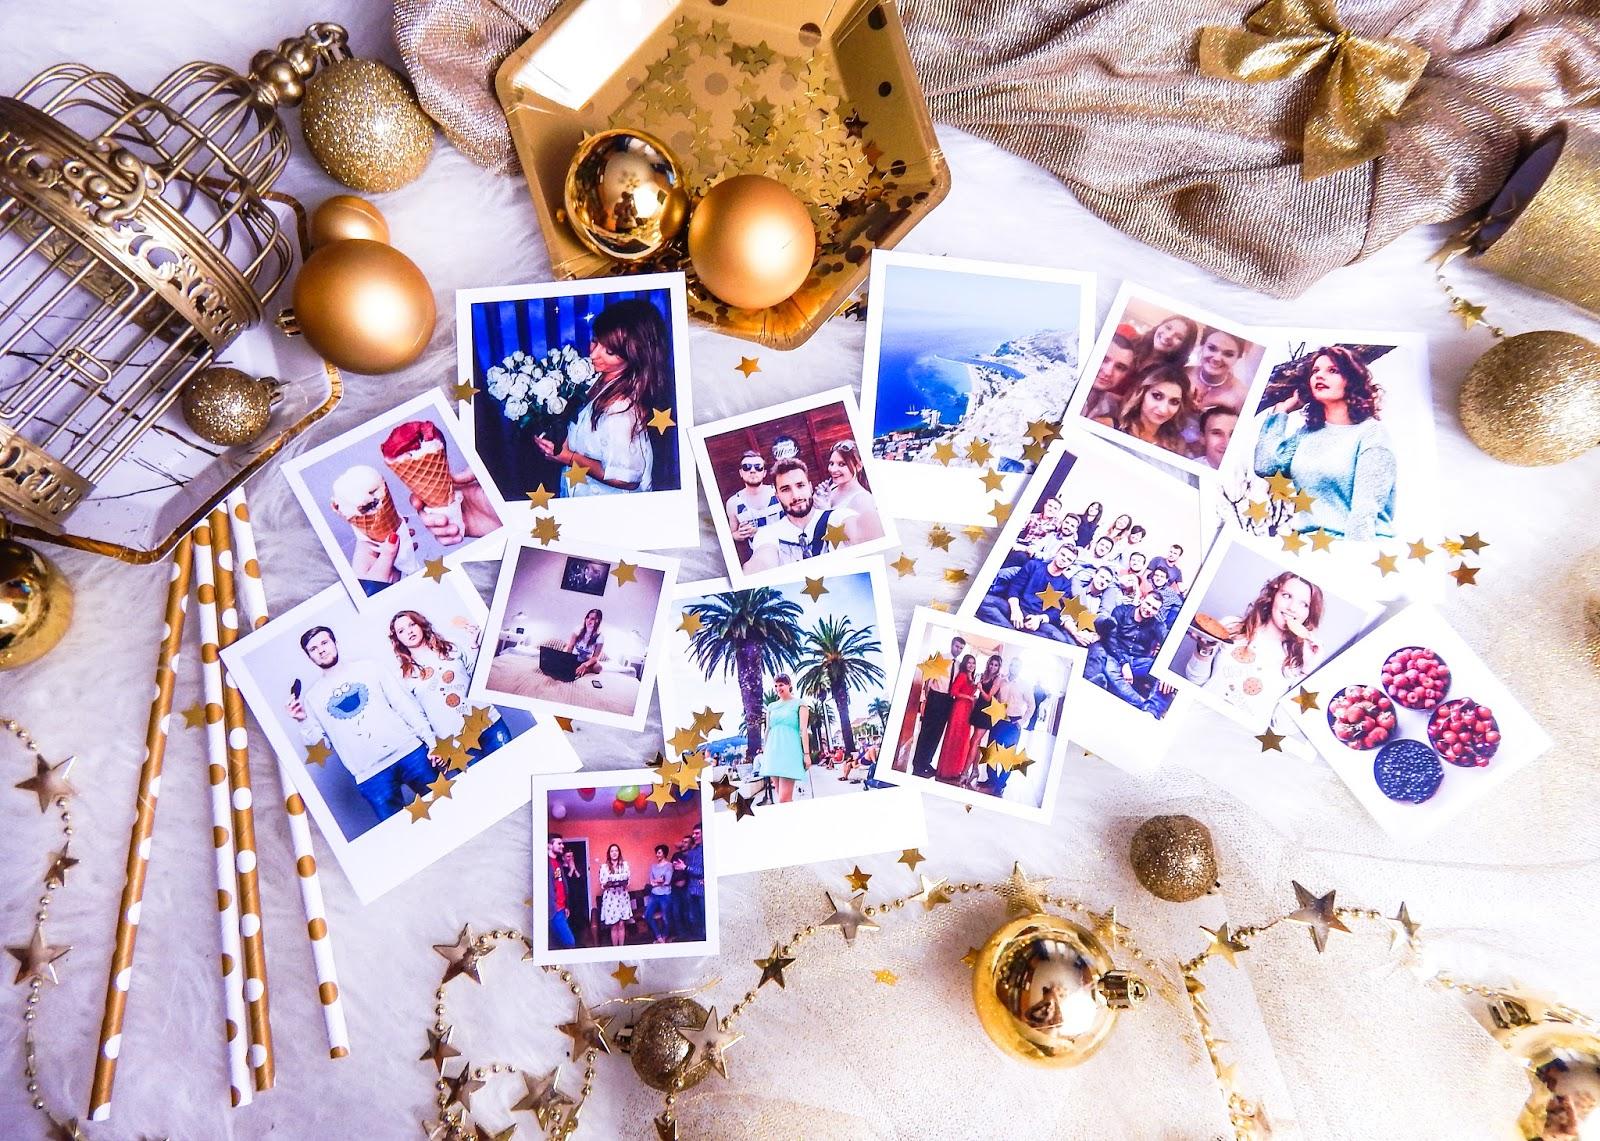 5 melodylaniella podsumowanie roku moj rok 2016 rabble party box blog lifestyle fotografia instagram